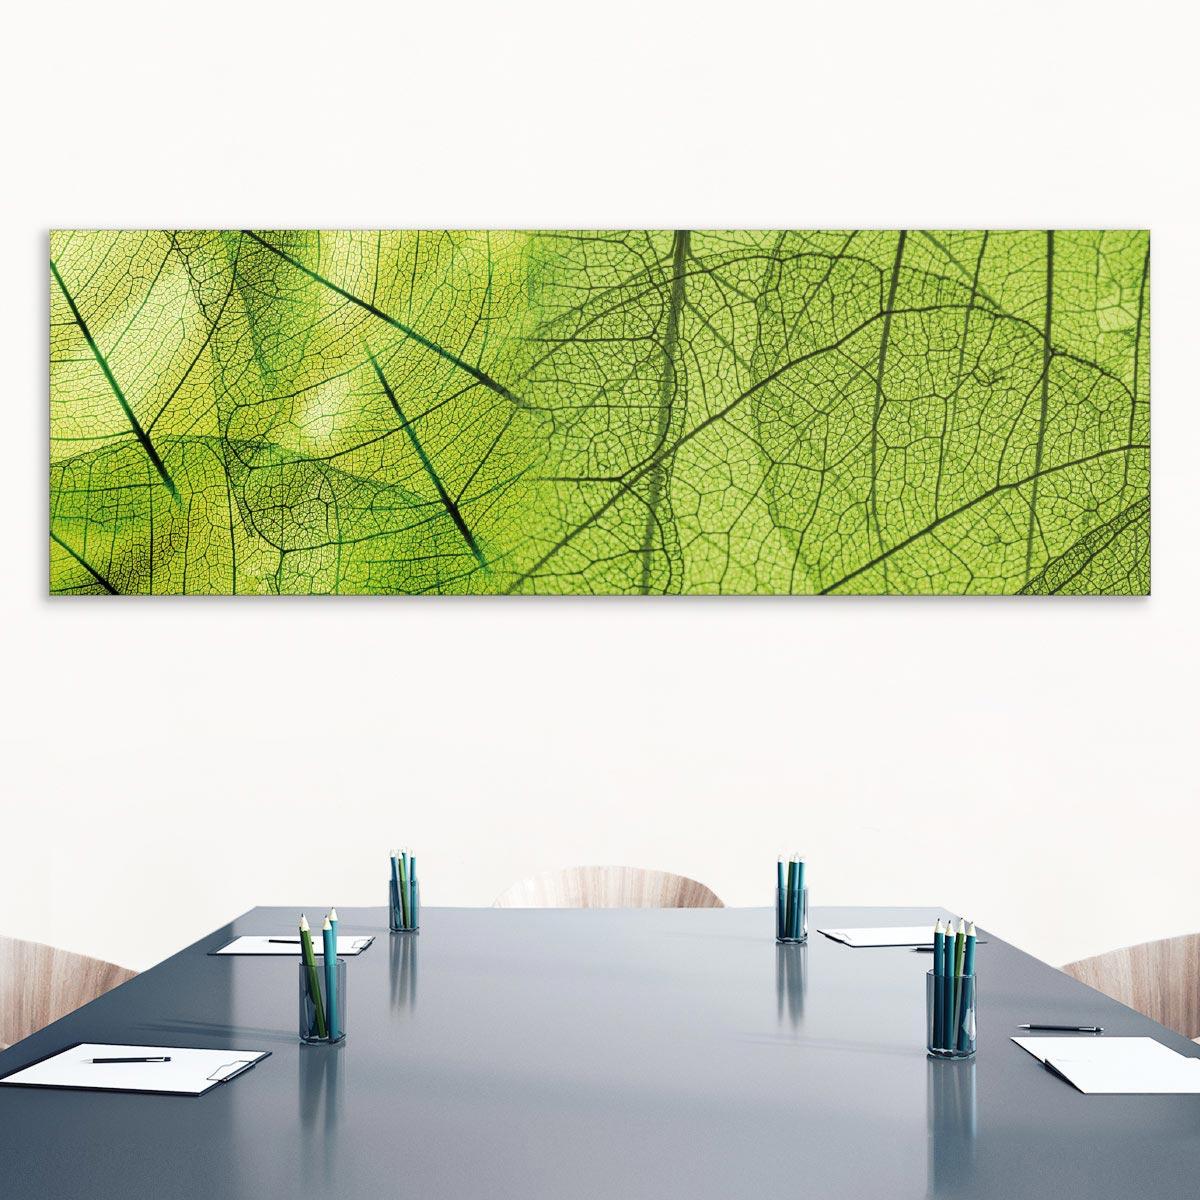 Akustikbild Struktur eines grünen Blattes